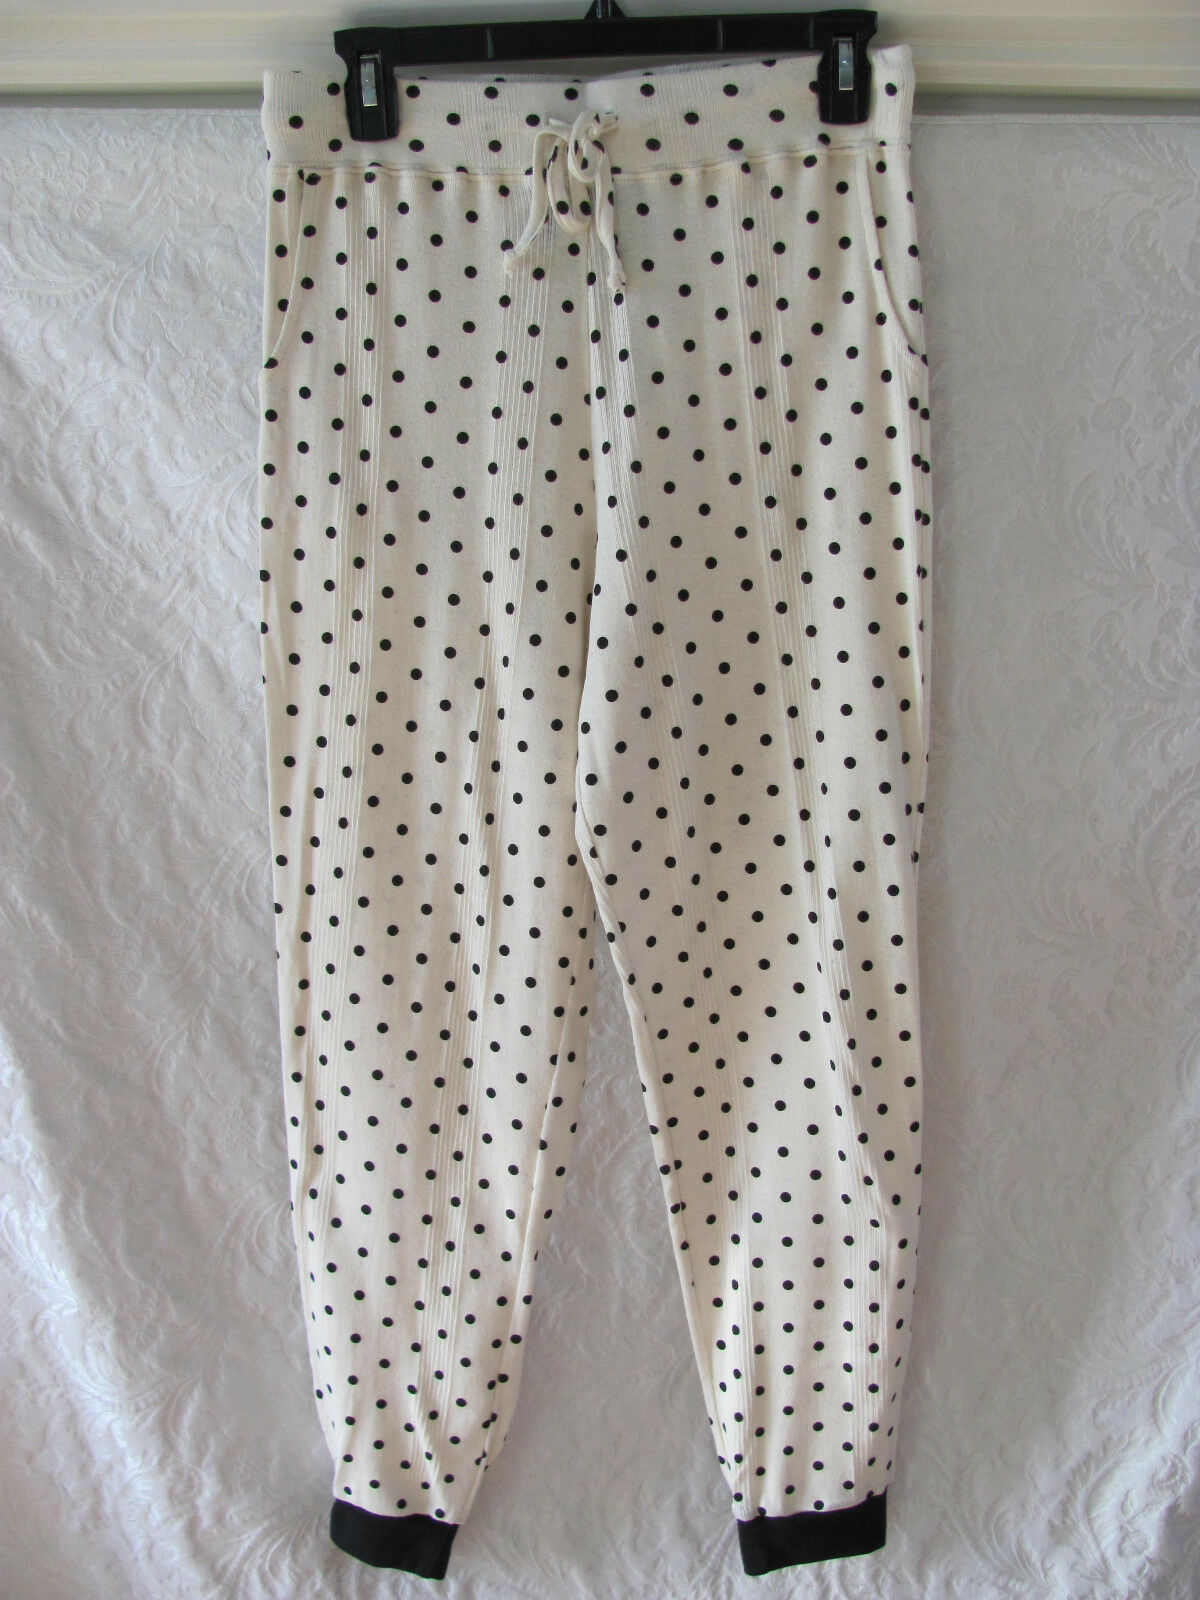 Edith Miller Sweatpants Lounge Pants Polka Dots-Vintage Champagne-Med- NWT  158